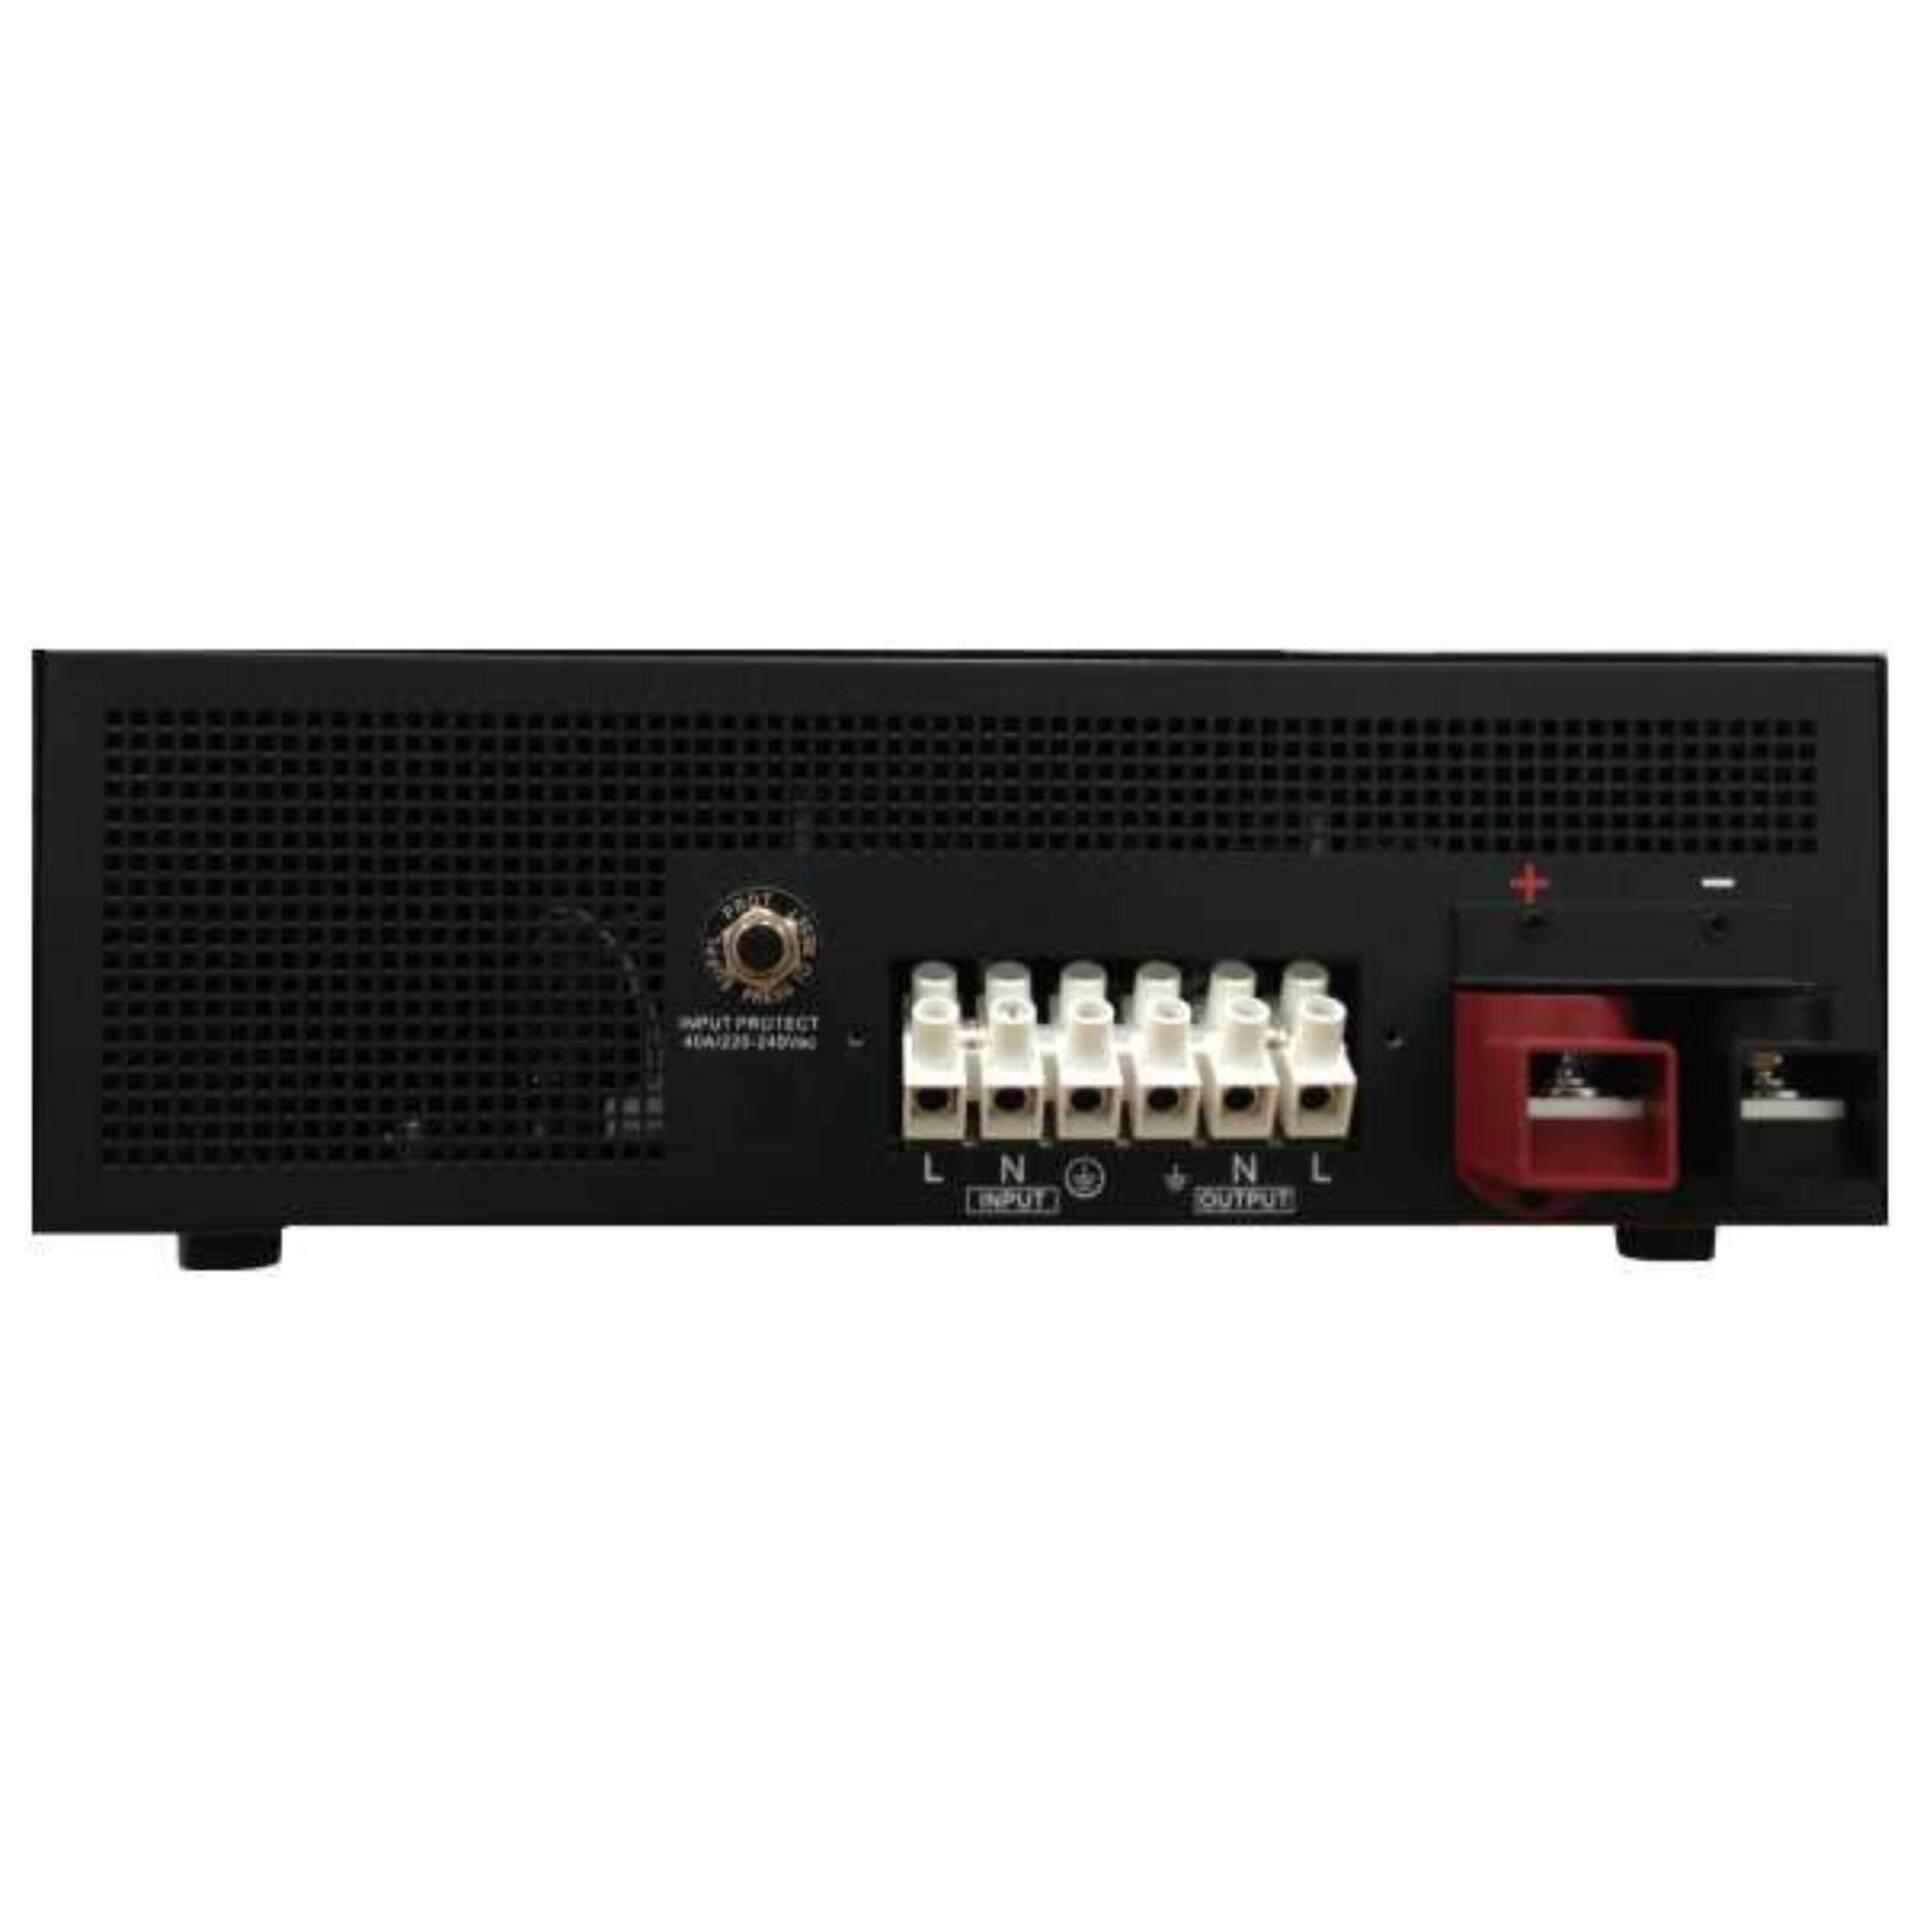 PROLiNK IPS5001 5000VA/4200W High Performance Inverter Power Supply (IPS) /  Generator with LCD Display